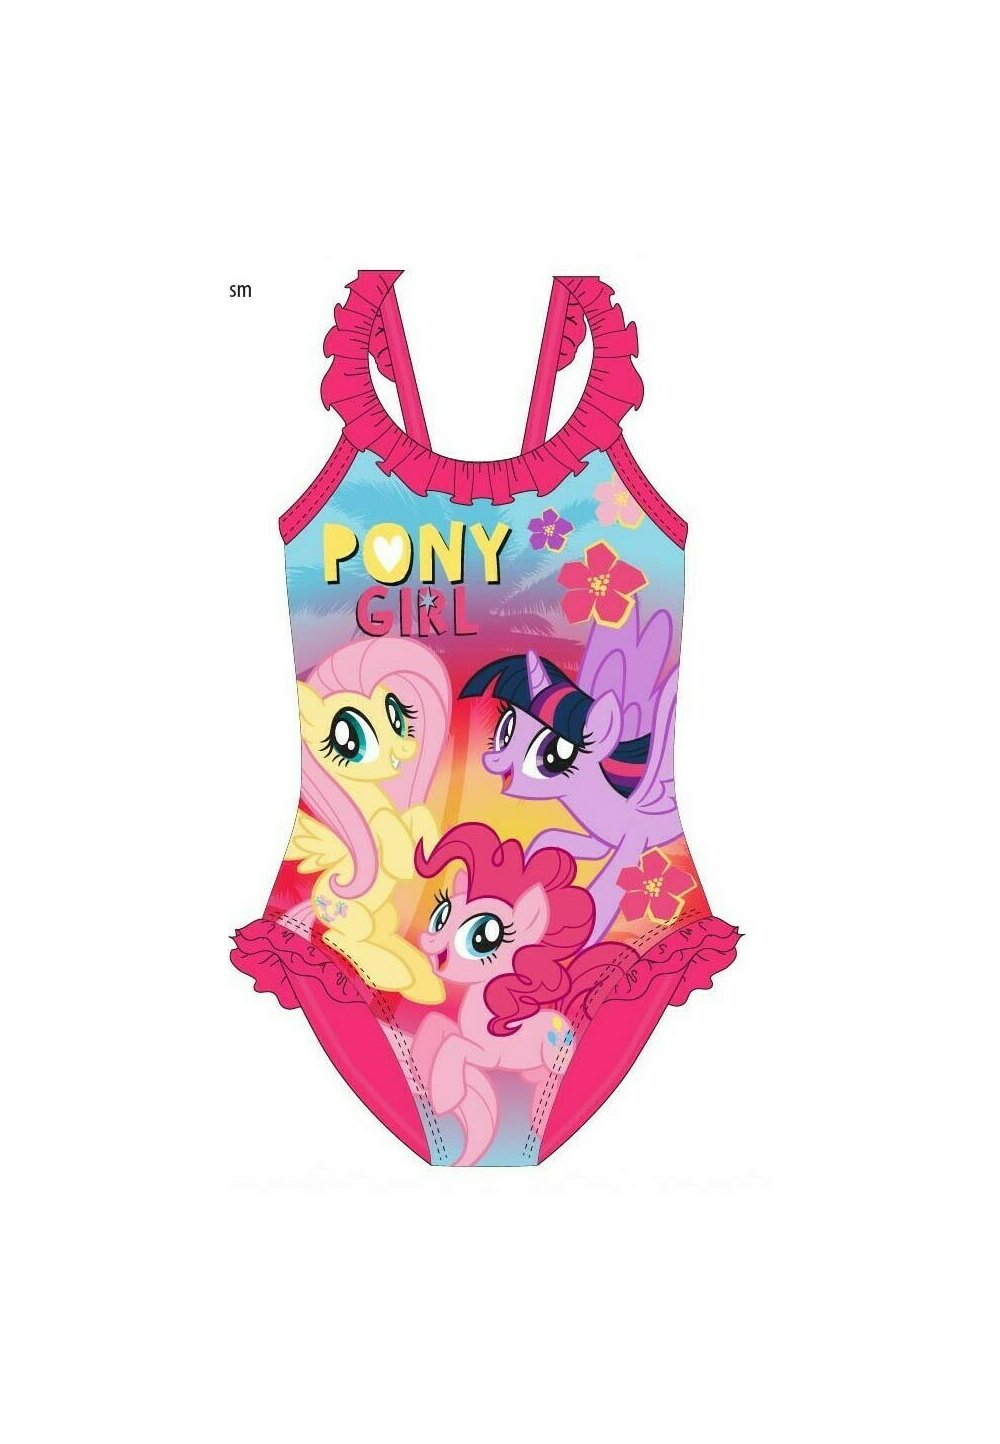 Costum de baie intreg, Pony girl, roz imagine